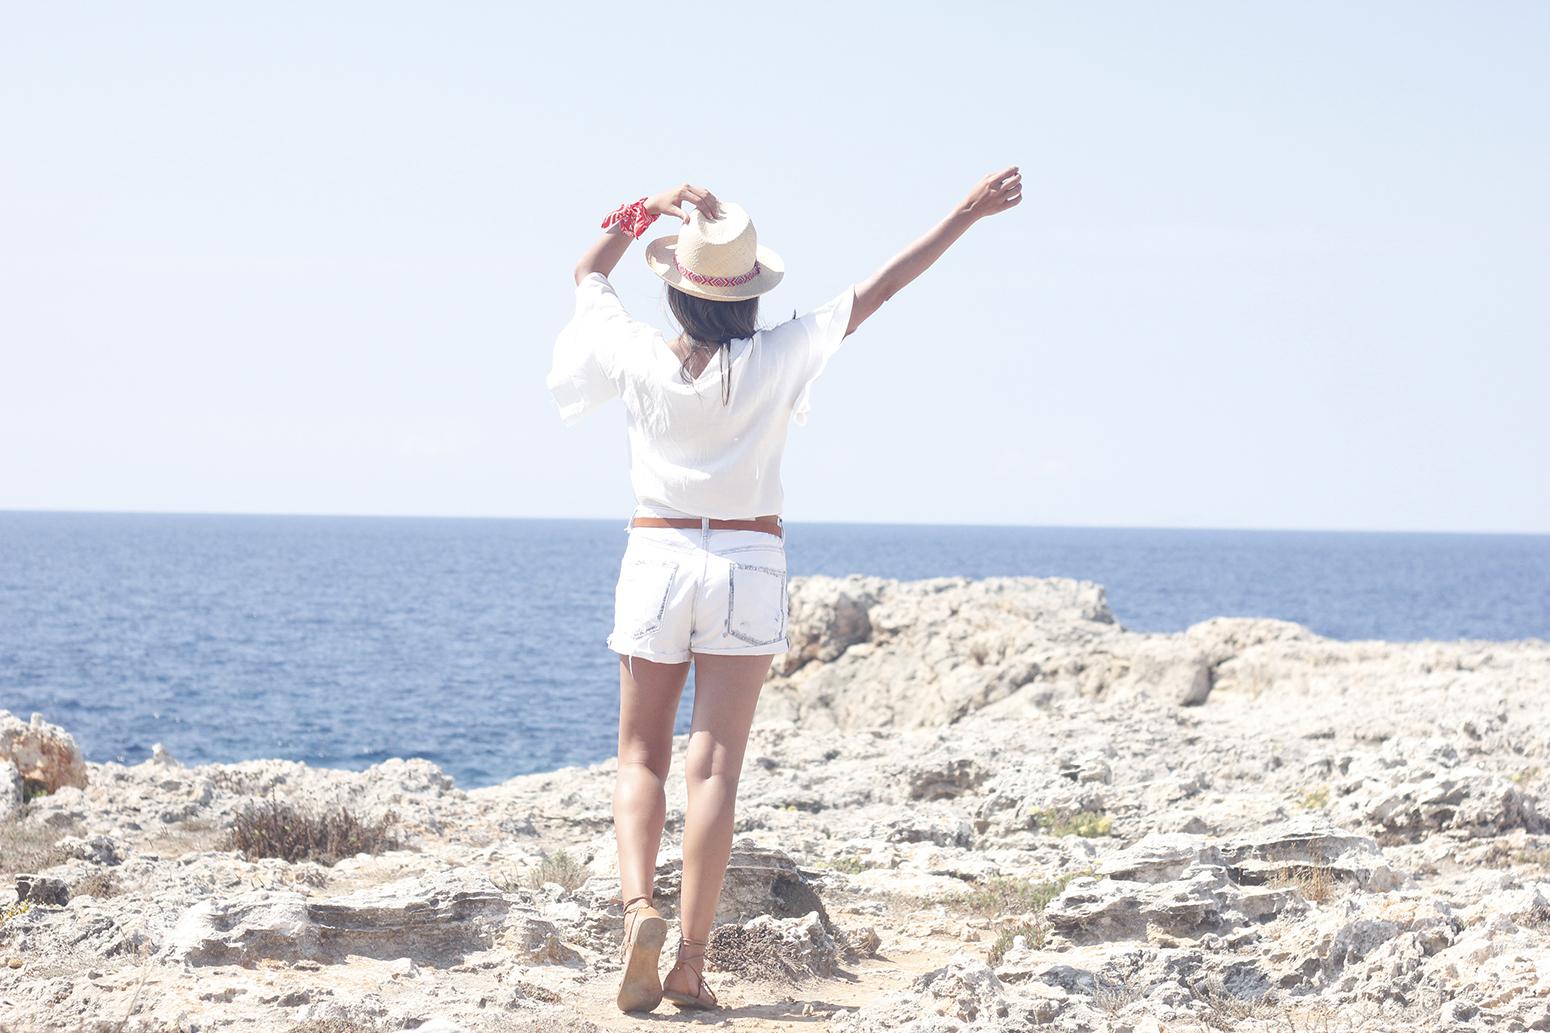 White Summer look bandana beach outfit06